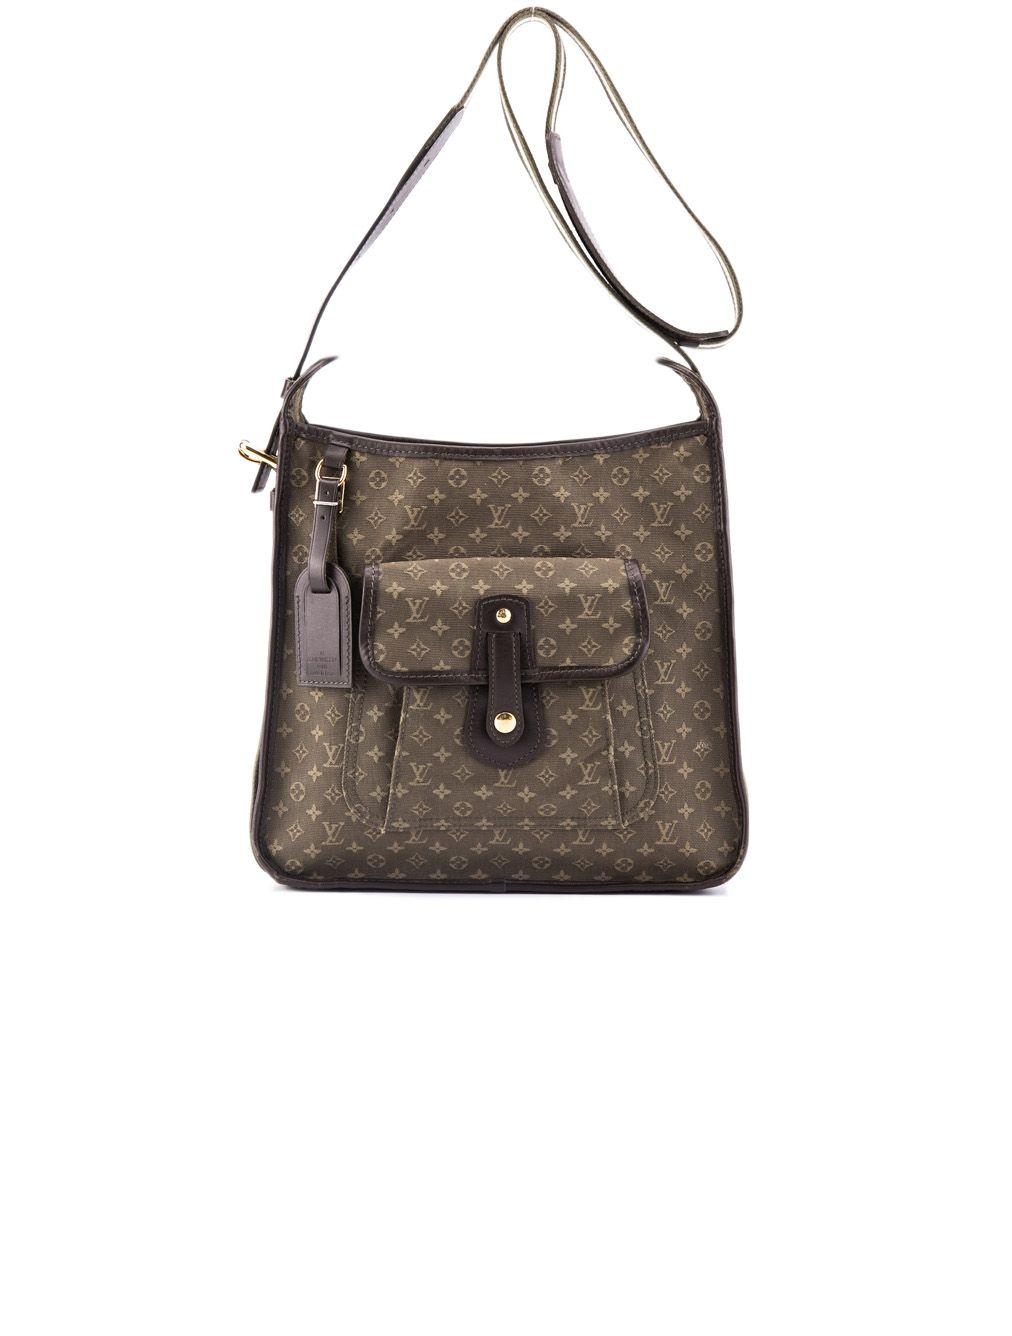 Louis Vuitton Crossbody Bag Price 495 00